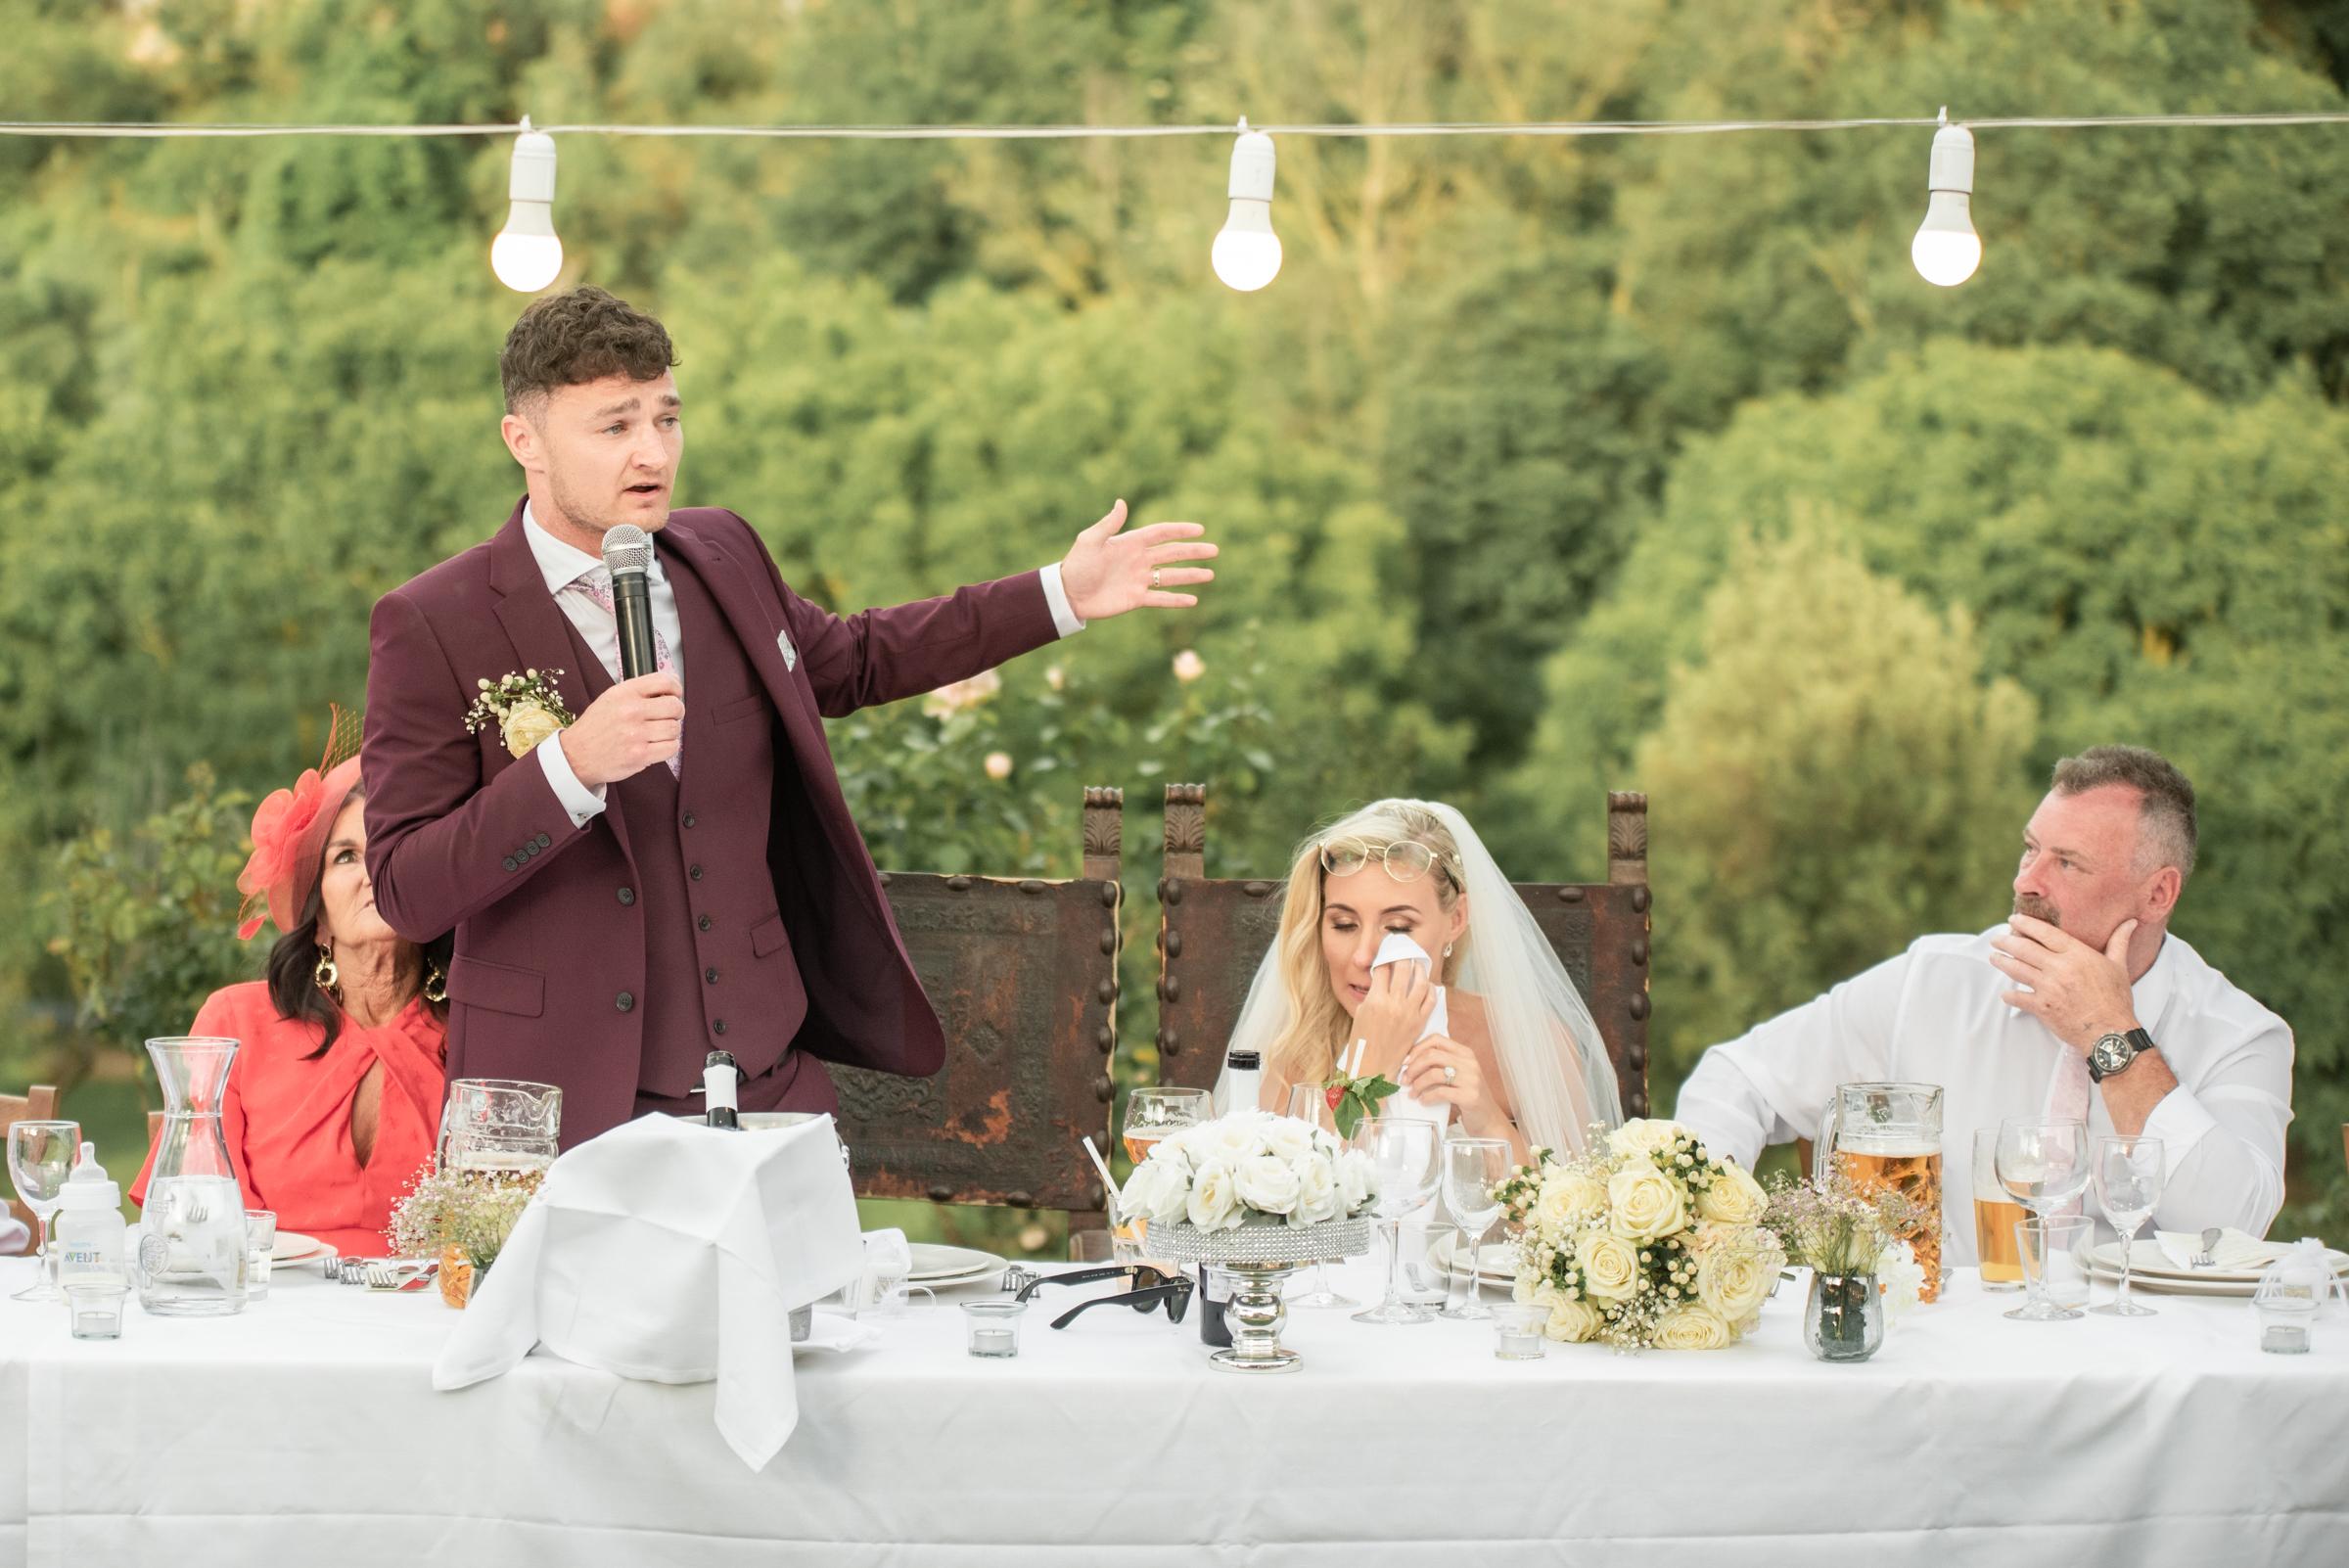 Borgo di tragliata Wedding-35.jpg